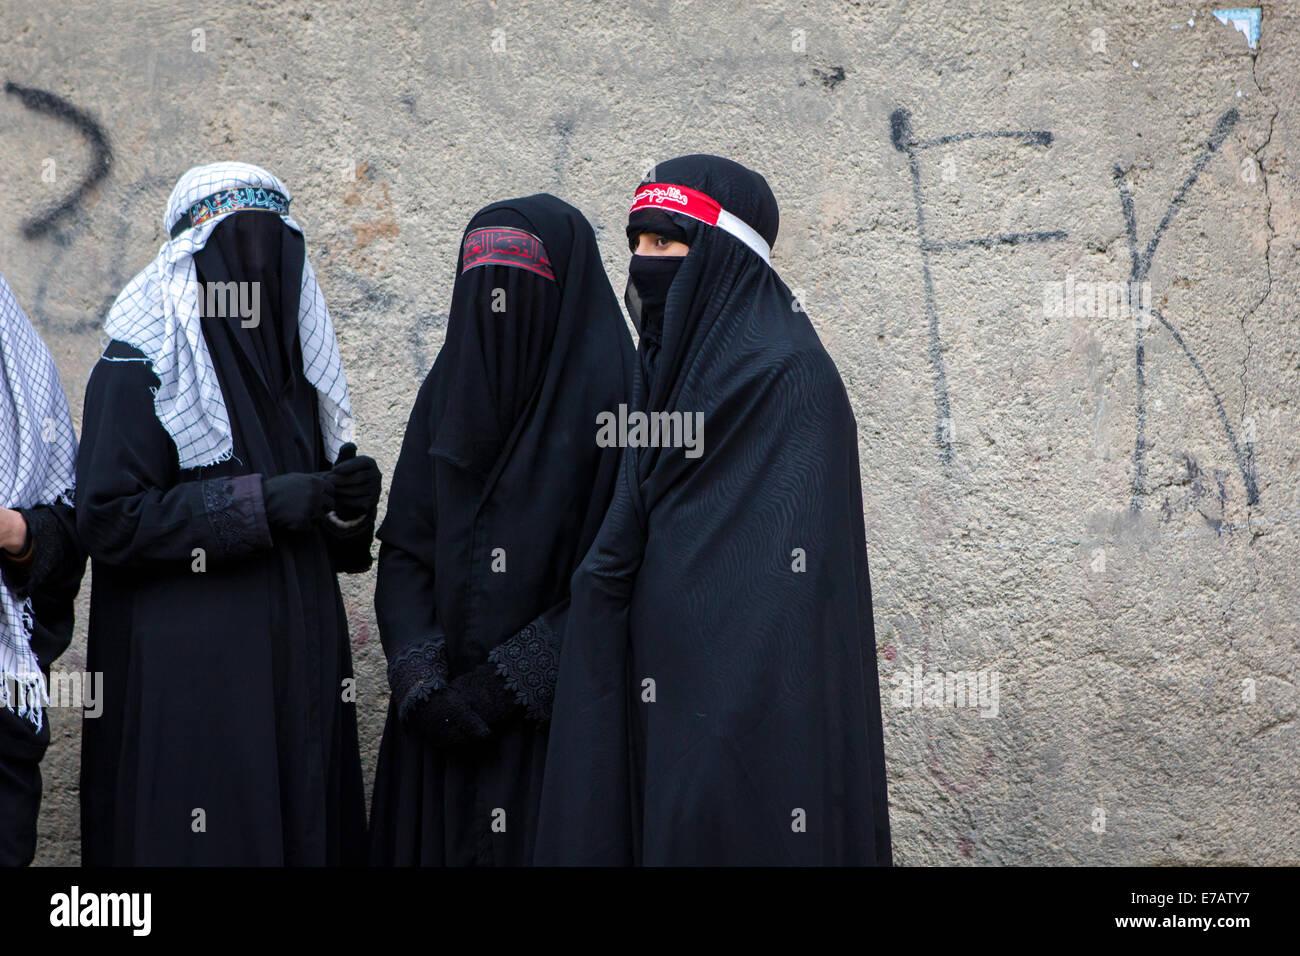 Why do Muslim women wear the chador?